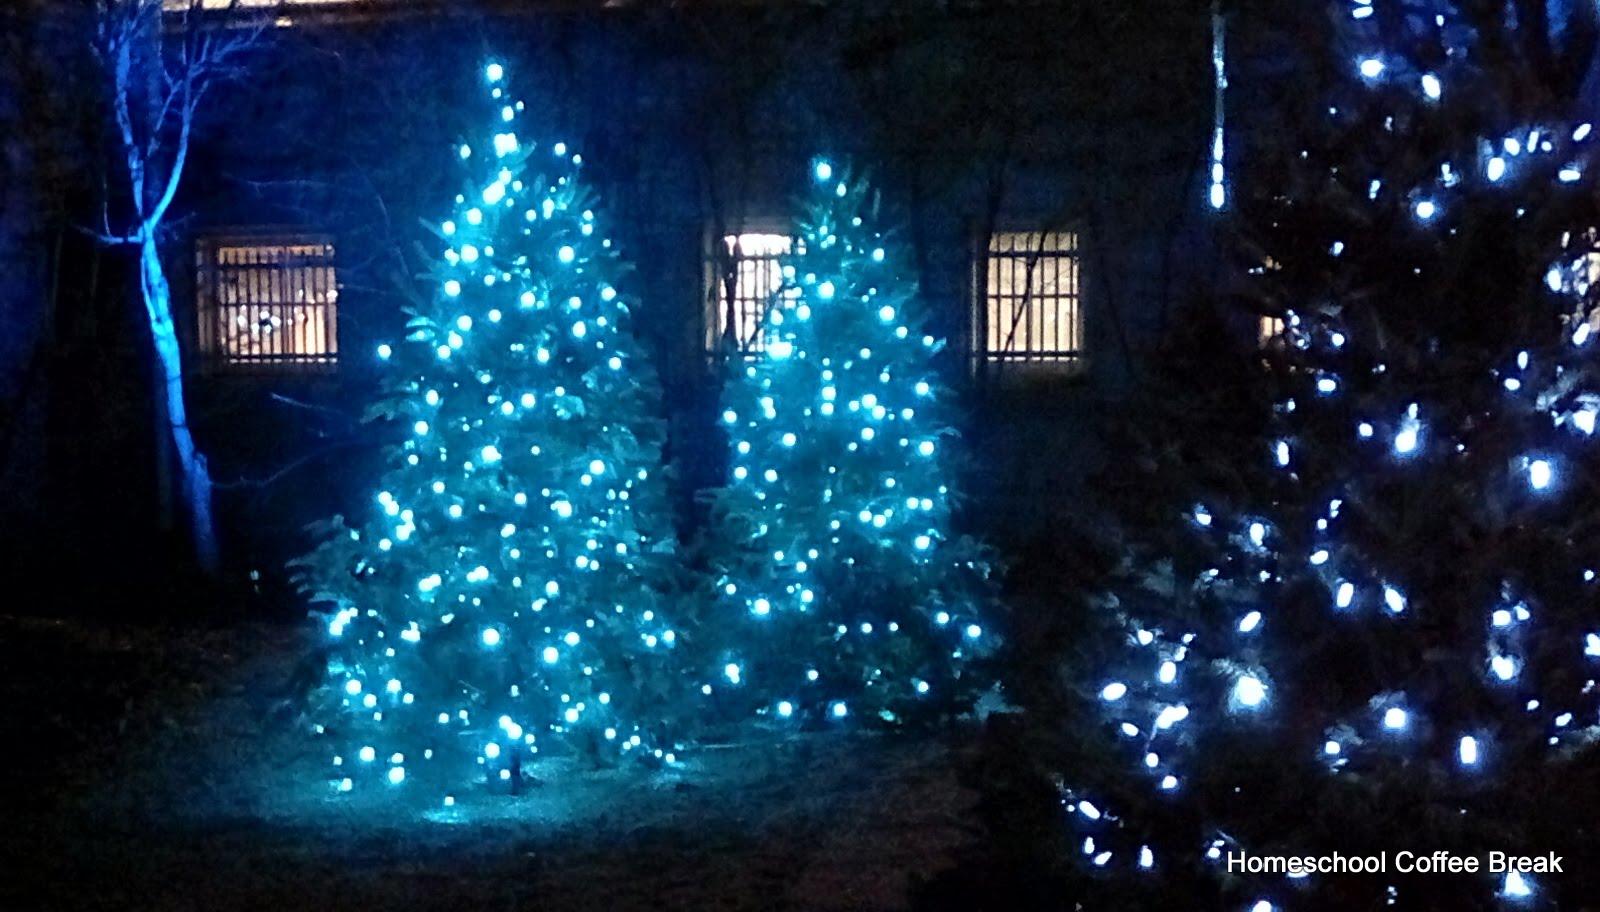 Franklin Park Conservatory Christmas Lights.Homeschool Coffee Break A Franklin Park Conservatory